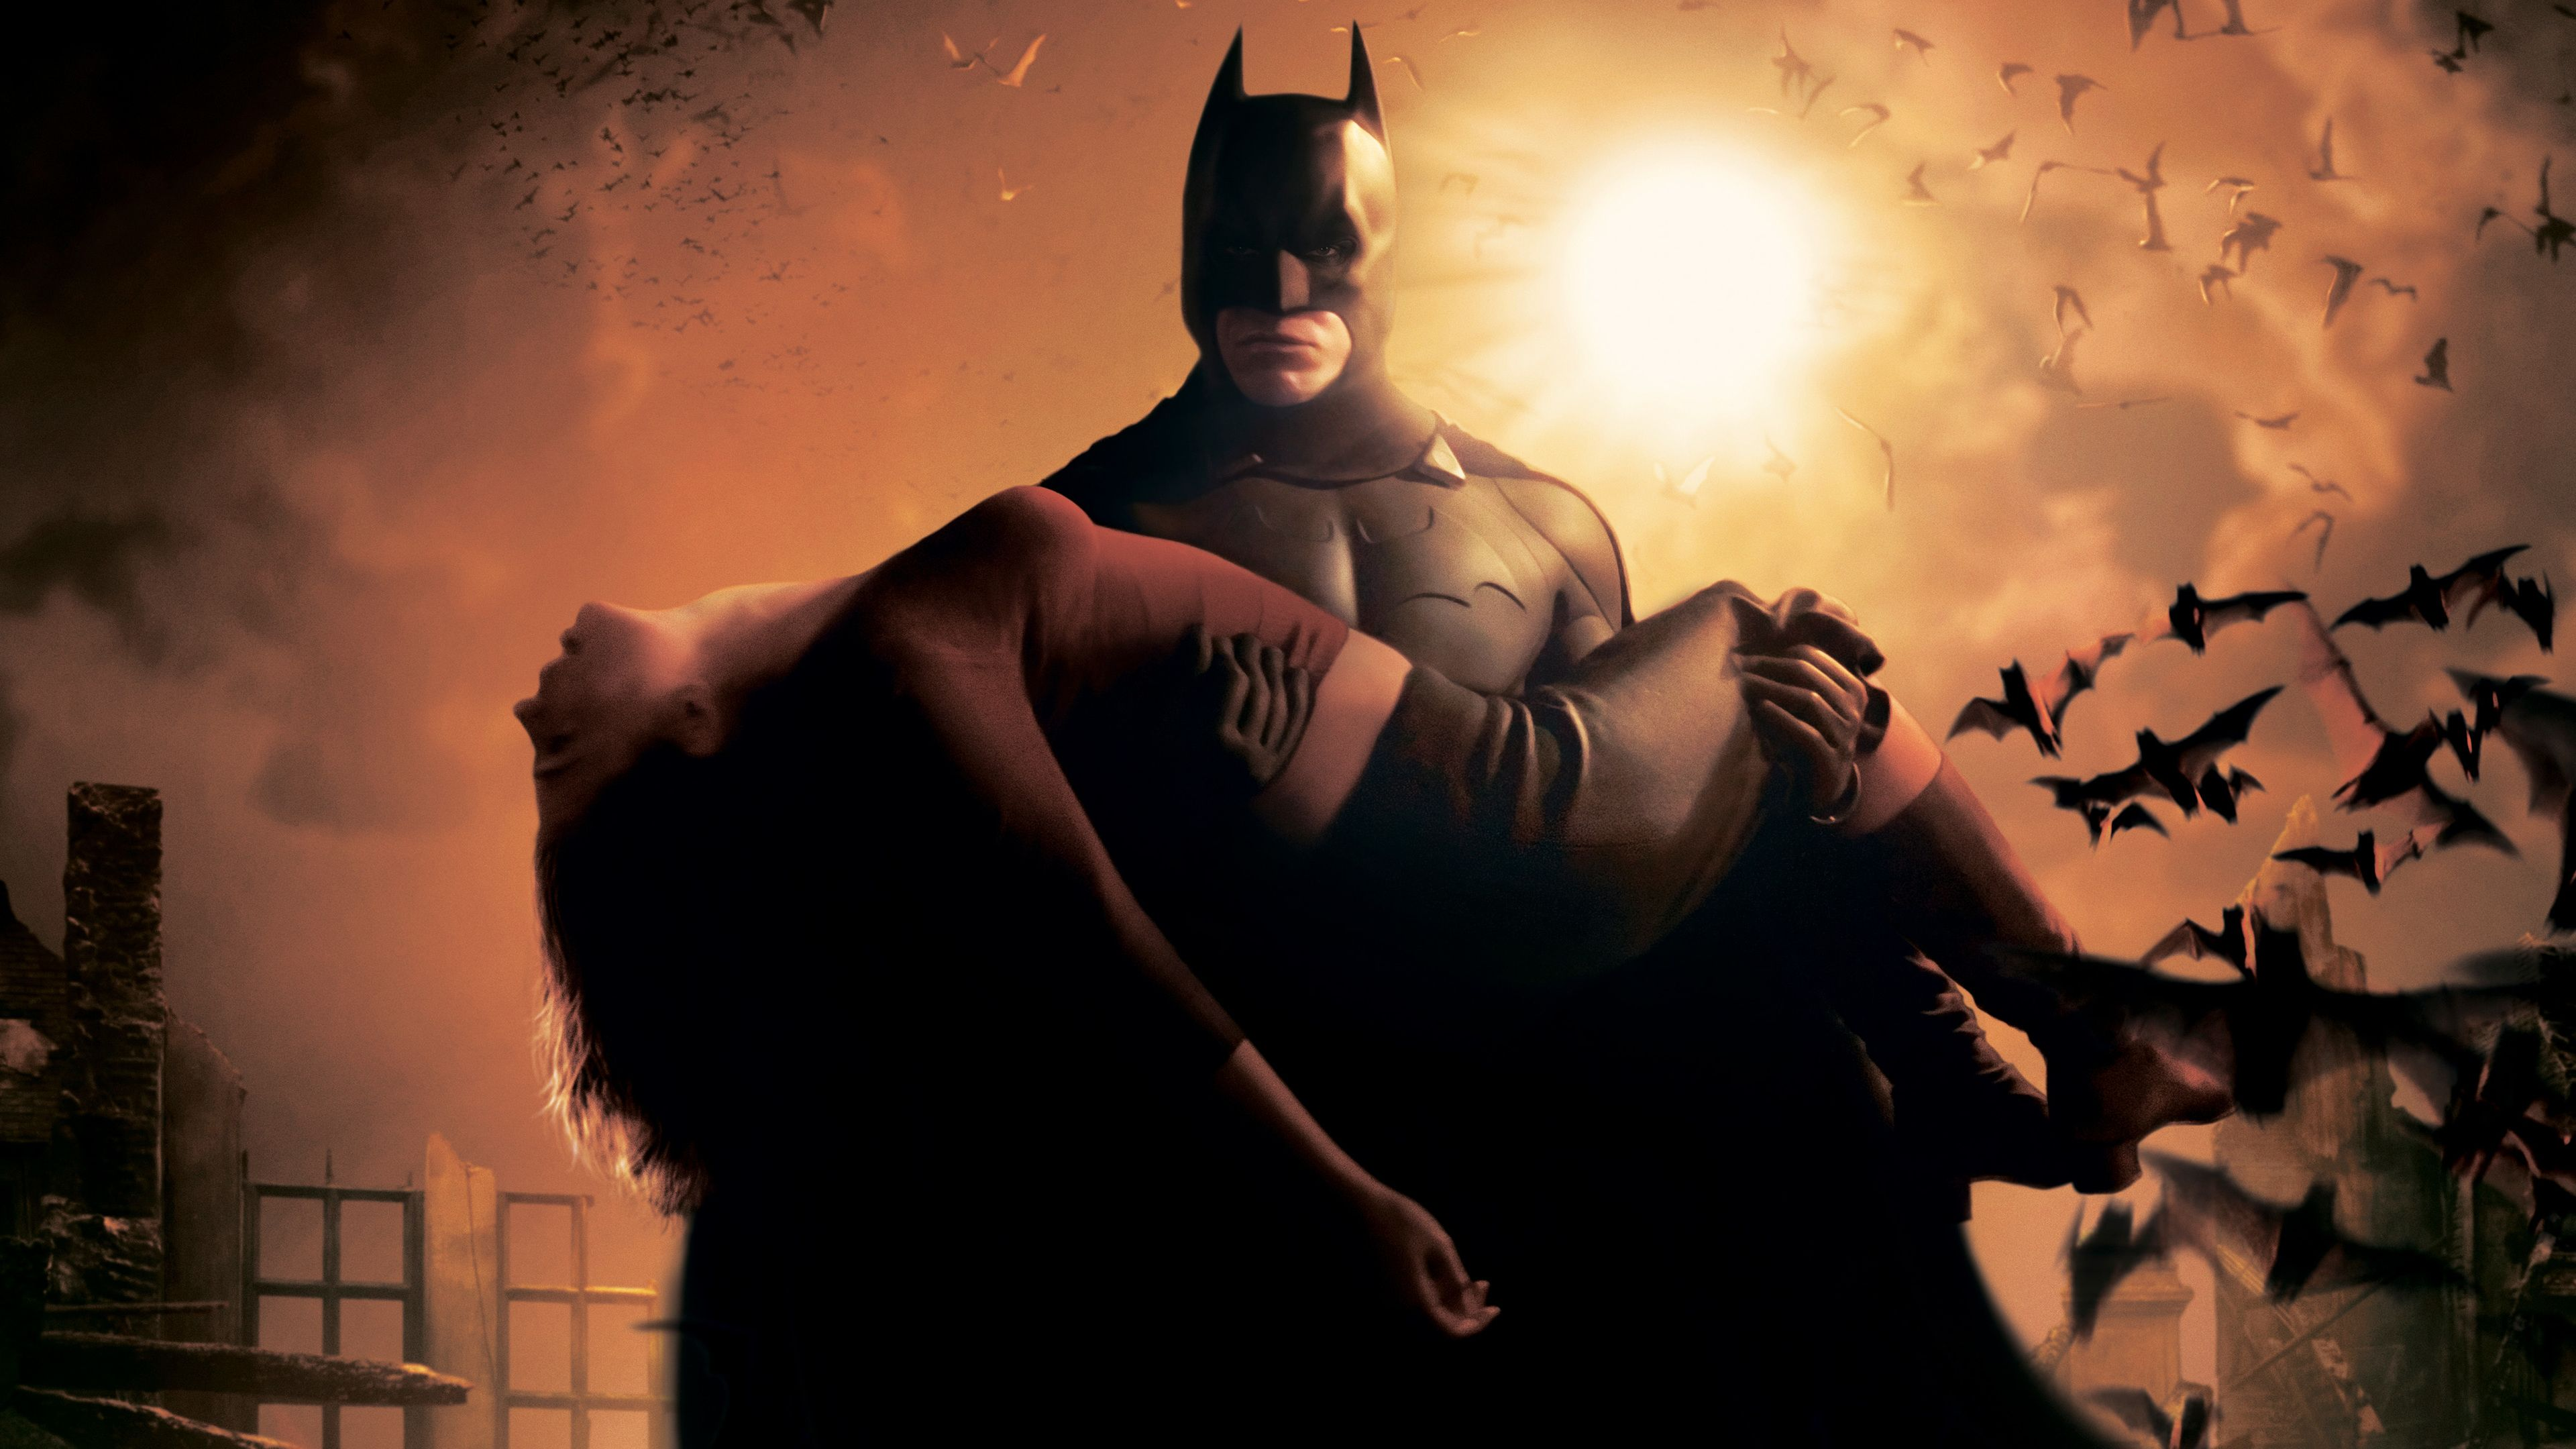 Katie Holmes Batman Begins Poster 4k Superheroes Wallpapers Hd Wallpapers Batman Wallpapers 4k Wallpap Batman Begins Movie Wallpapers Free Download Pictures